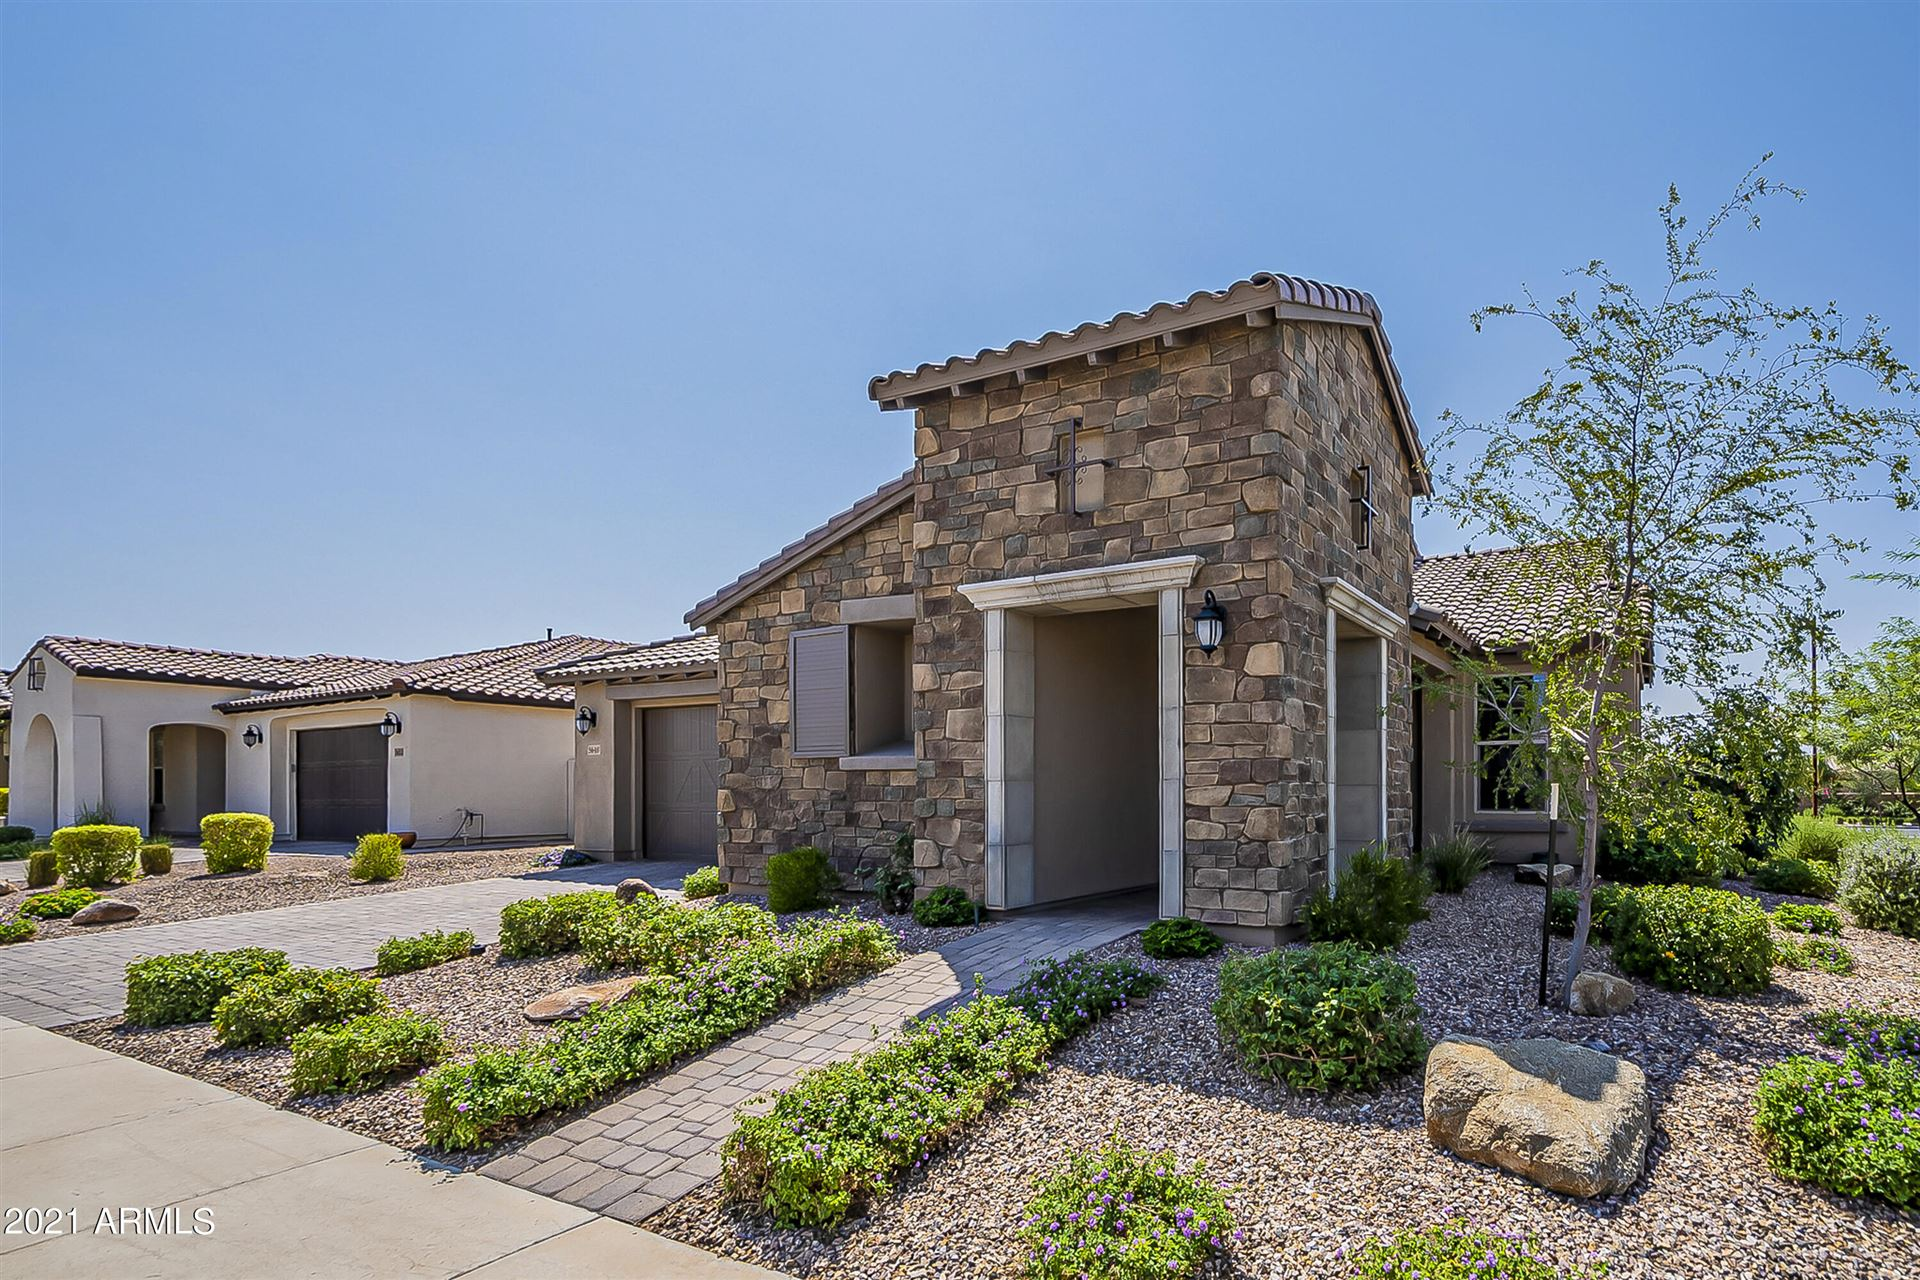 Photo of 5648 S WINCHESTER --, Mesa, AZ 85212 (MLS # 6293873)